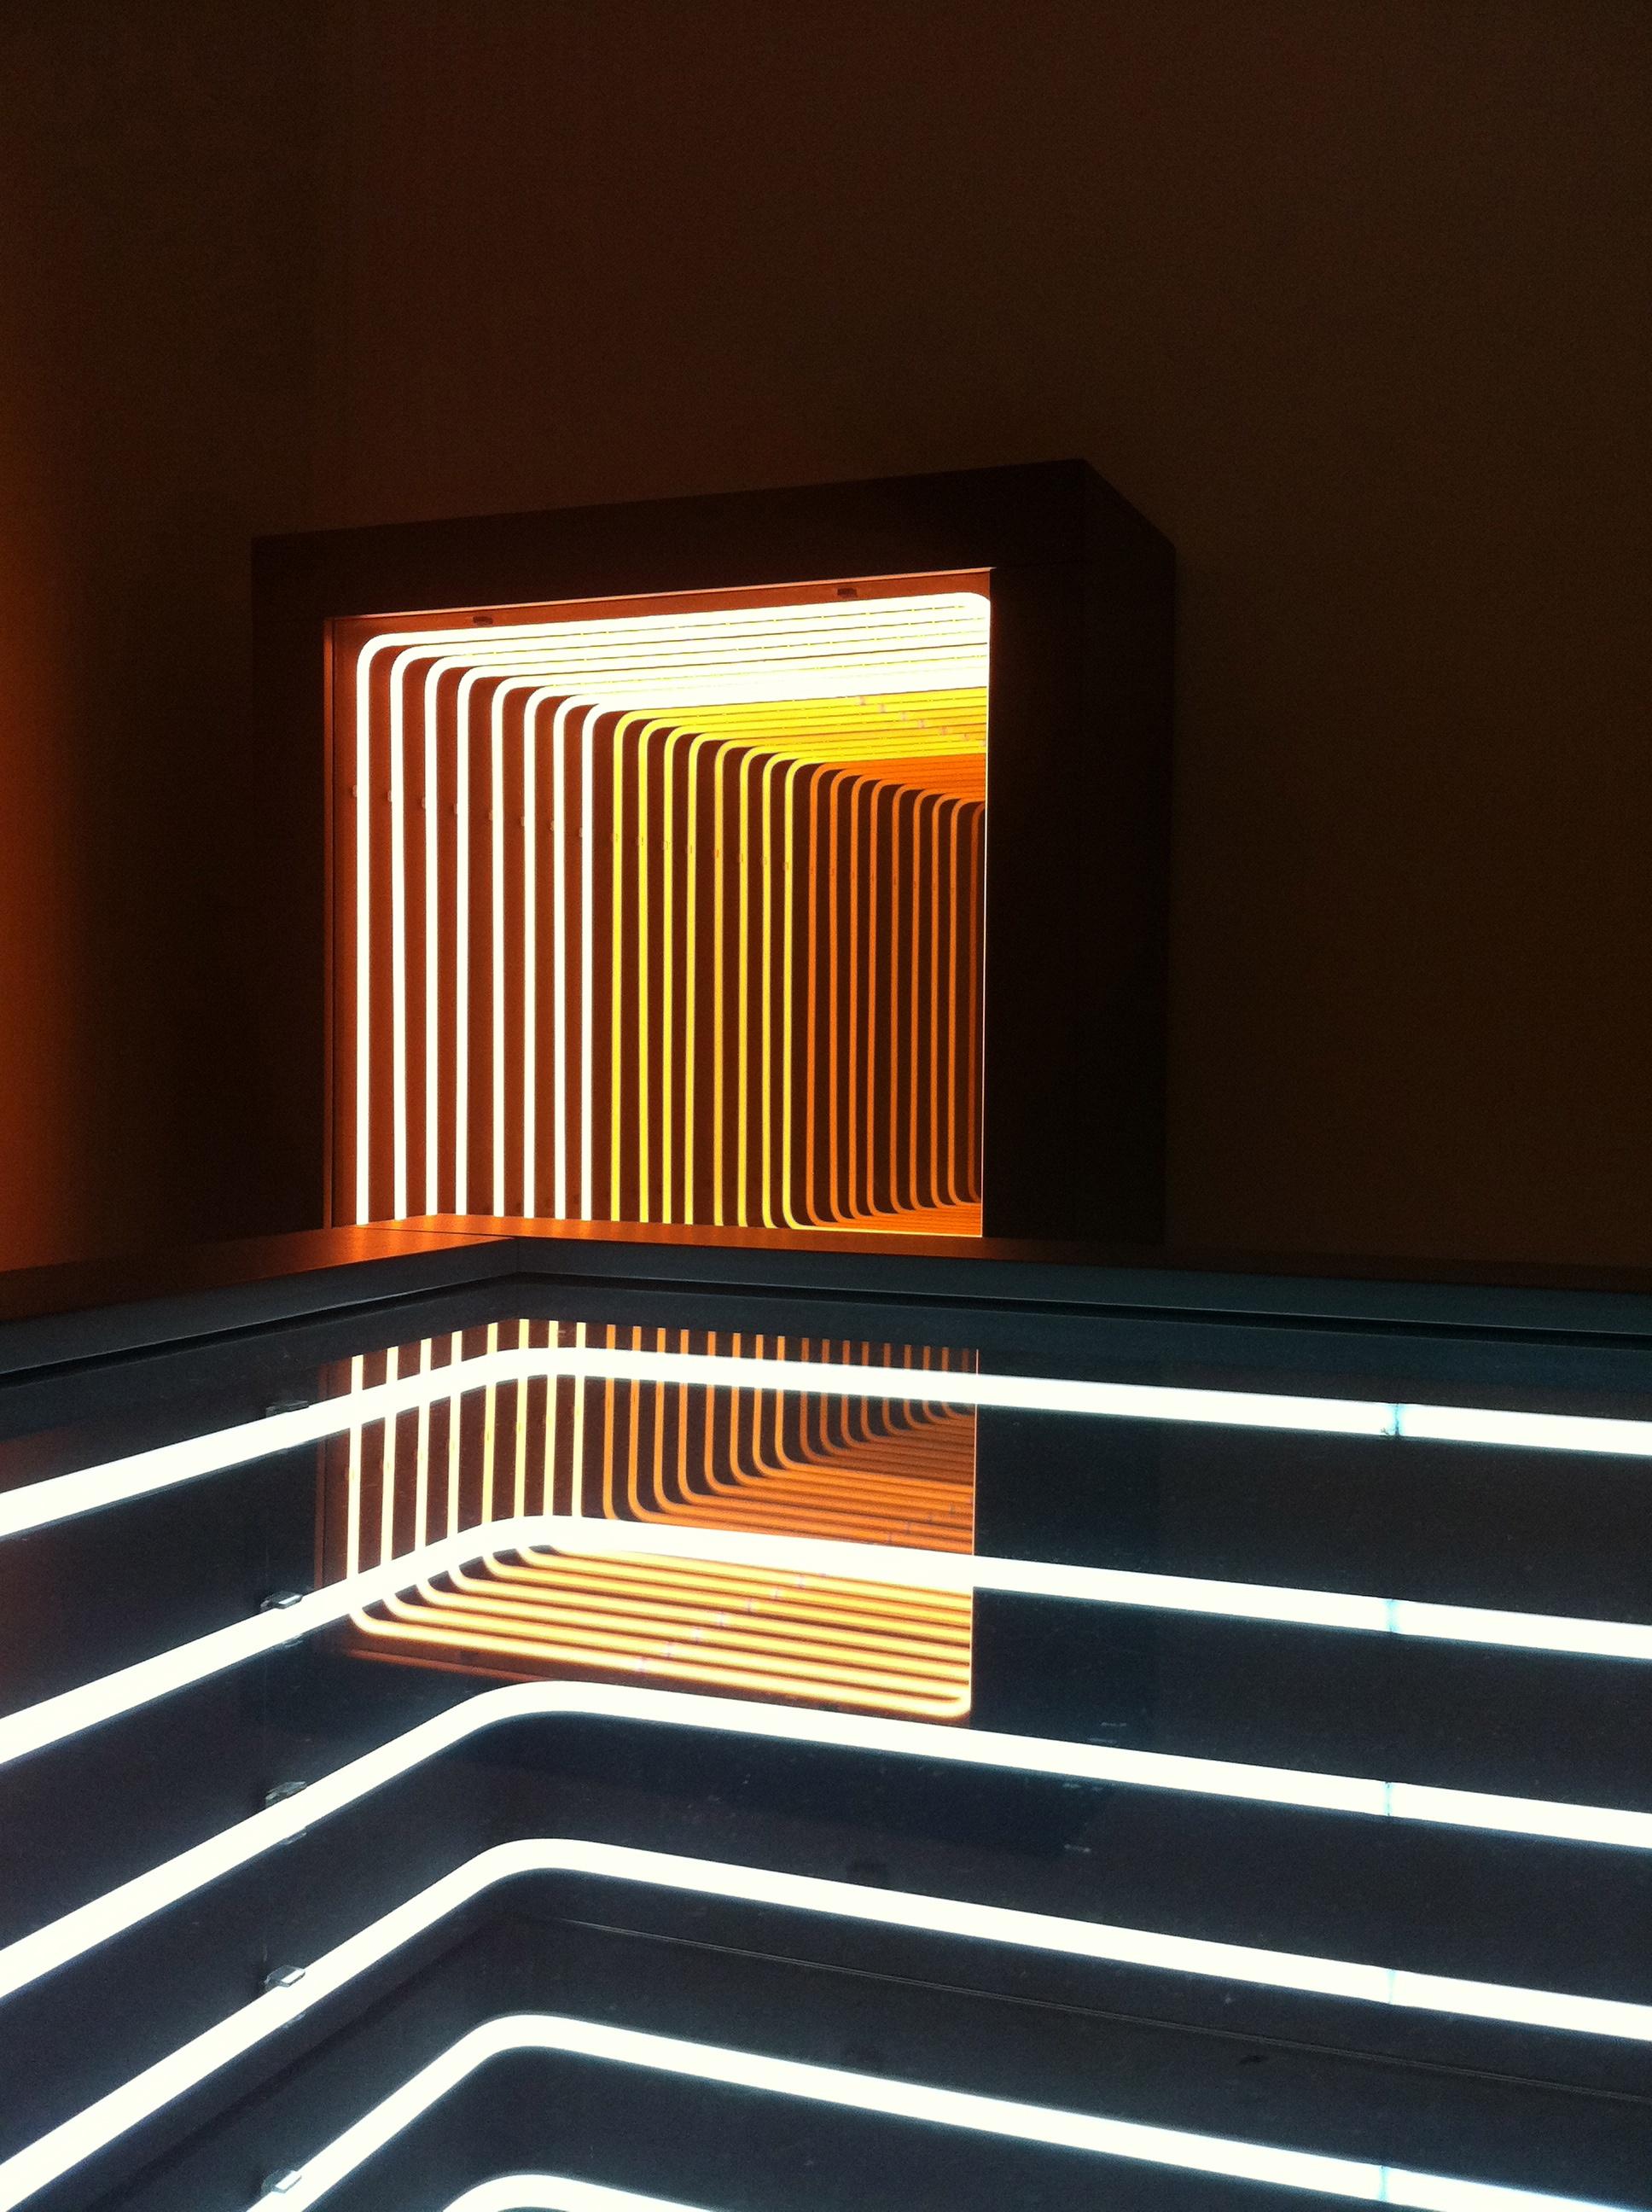 Pioneering Light Artist Paolo Scirpa's Infinite Neon Loops ...